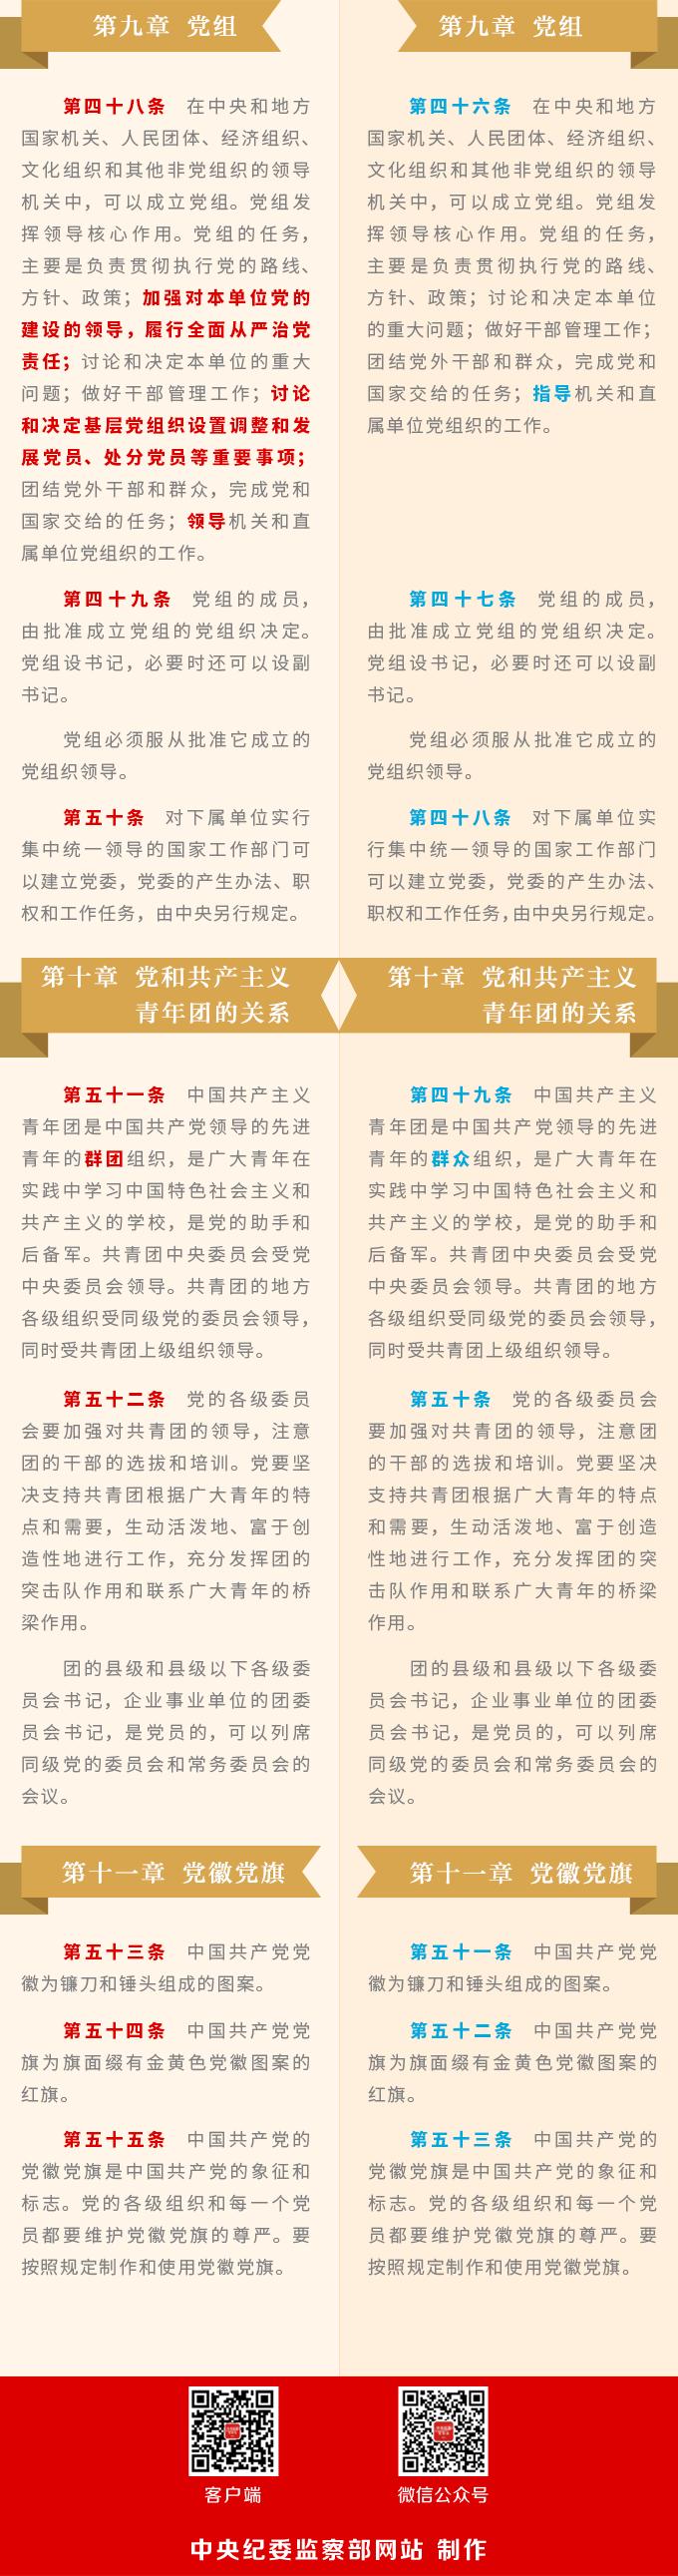 http://www.ccdi.gov.cn/yw/201710/W020171031664658042184.png